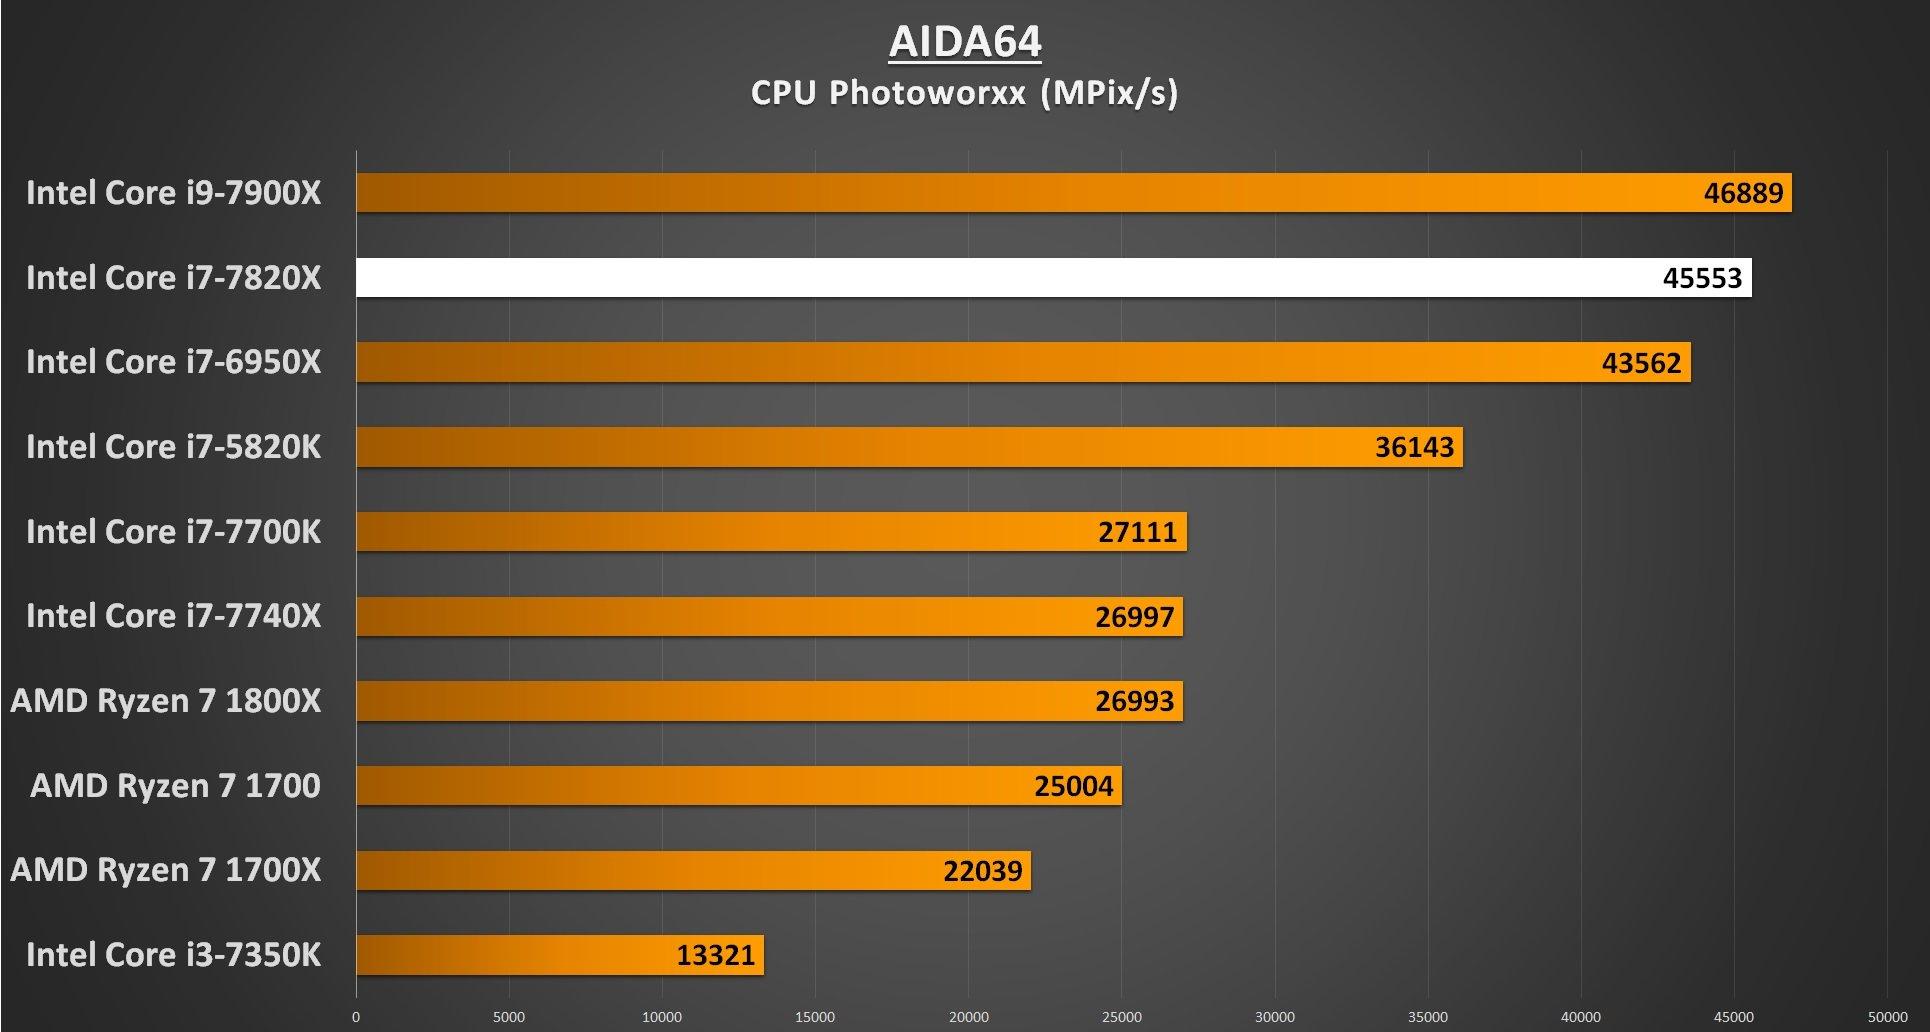 AIDA64 CPU Photoworxx - i7-7820X Performance